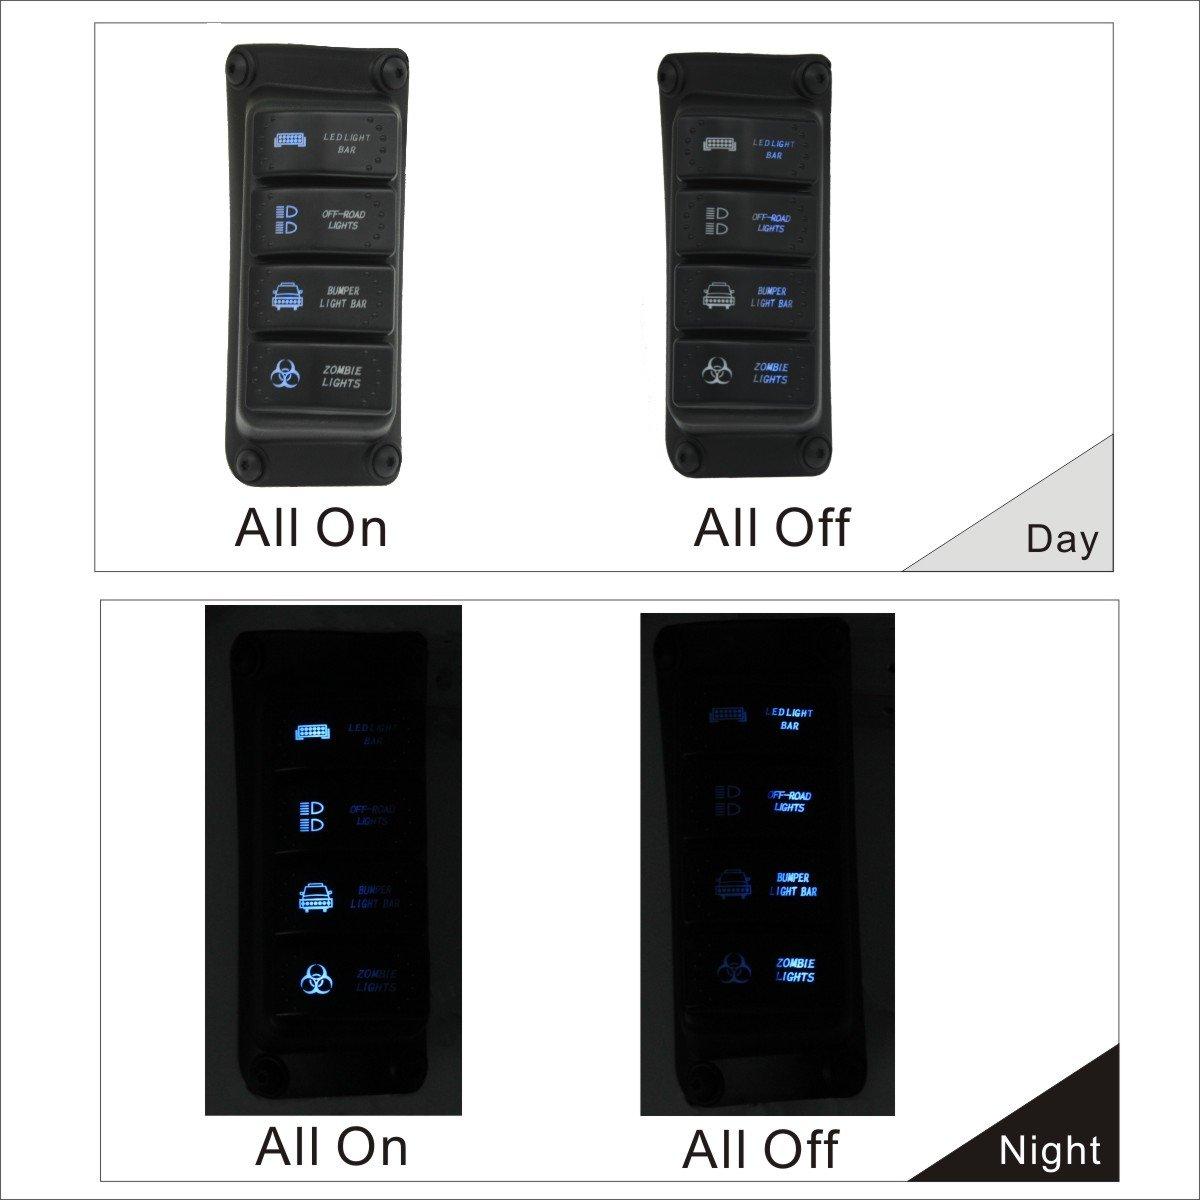 Apollointech Left Side A Pillar 4 Switch Pod Panel 2014 Wrangler Fuse Box Source Control System Fit Jeep Jk Jku 2007 2017 Blue Back Light